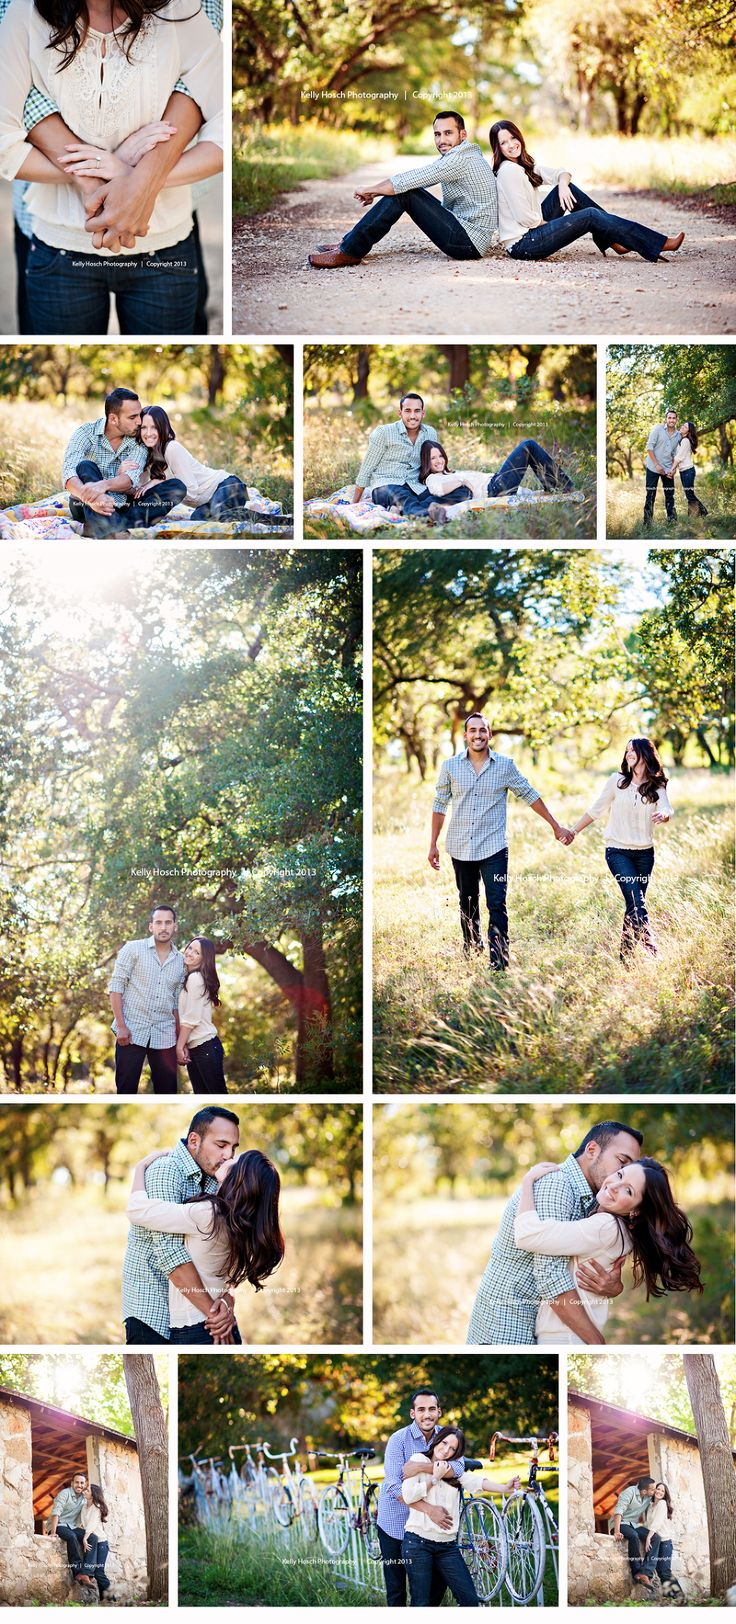 Jonathan + Elizabeth | Salado Texas Photographer » Kelly Hosch Photography | Temple, Belton, Salado , Waco, Georgetown, Round Rock Texas Photographer